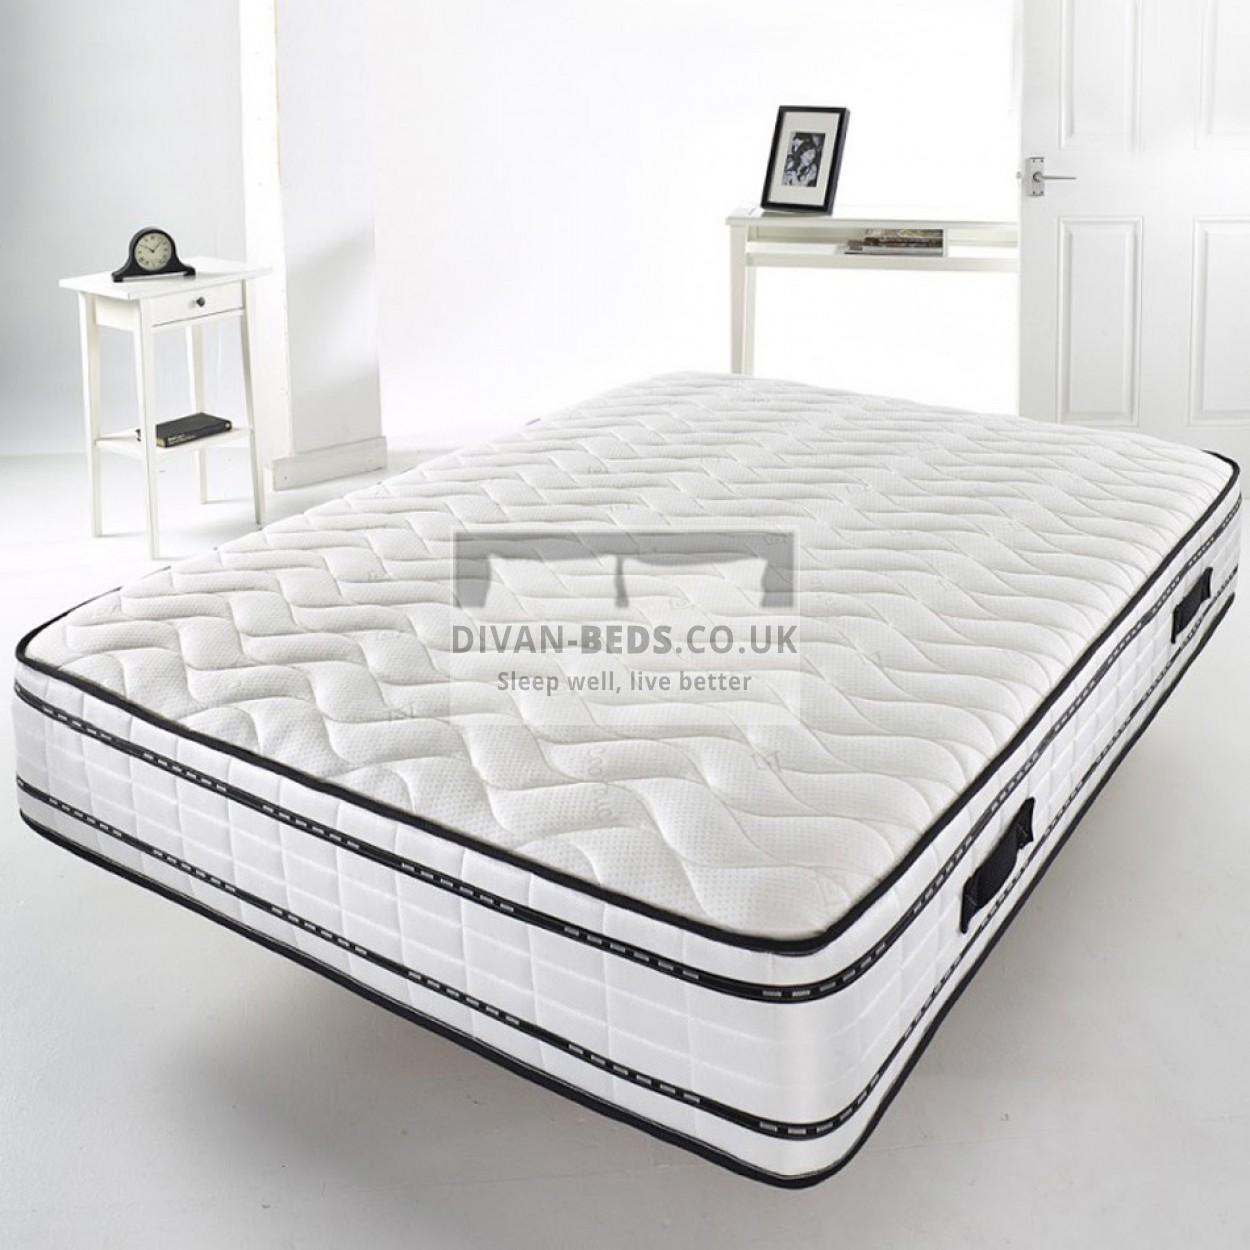 2000 pocket spring quilted memory foam mattress with. Black Bedroom Furniture Sets. Home Design Ideas